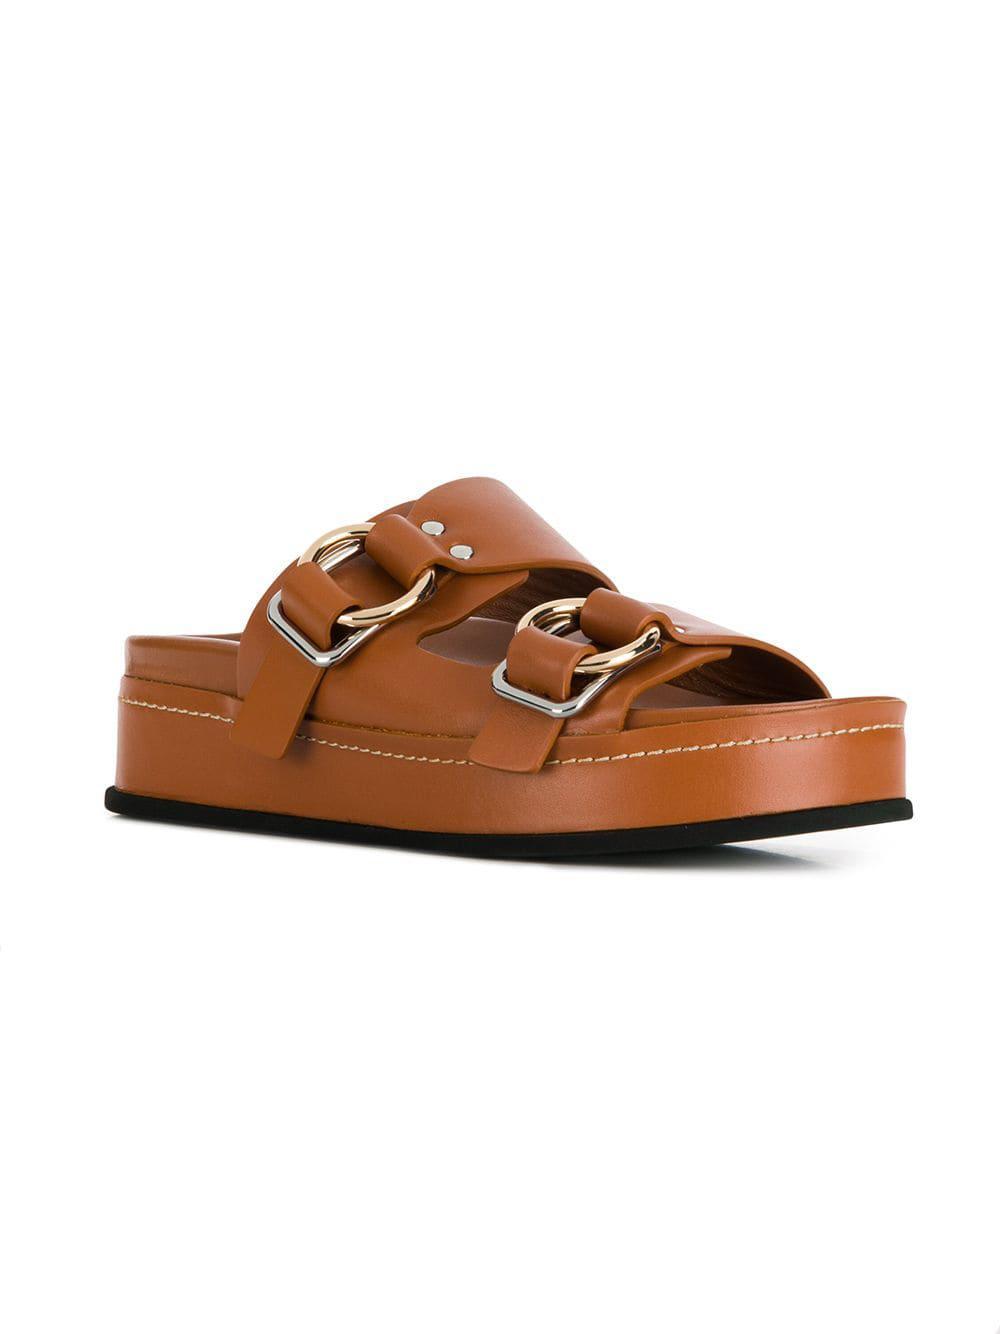 777ed784ddc2 Lyst - 3.1 Phillip Lim Freida Platform Sandals in Brown